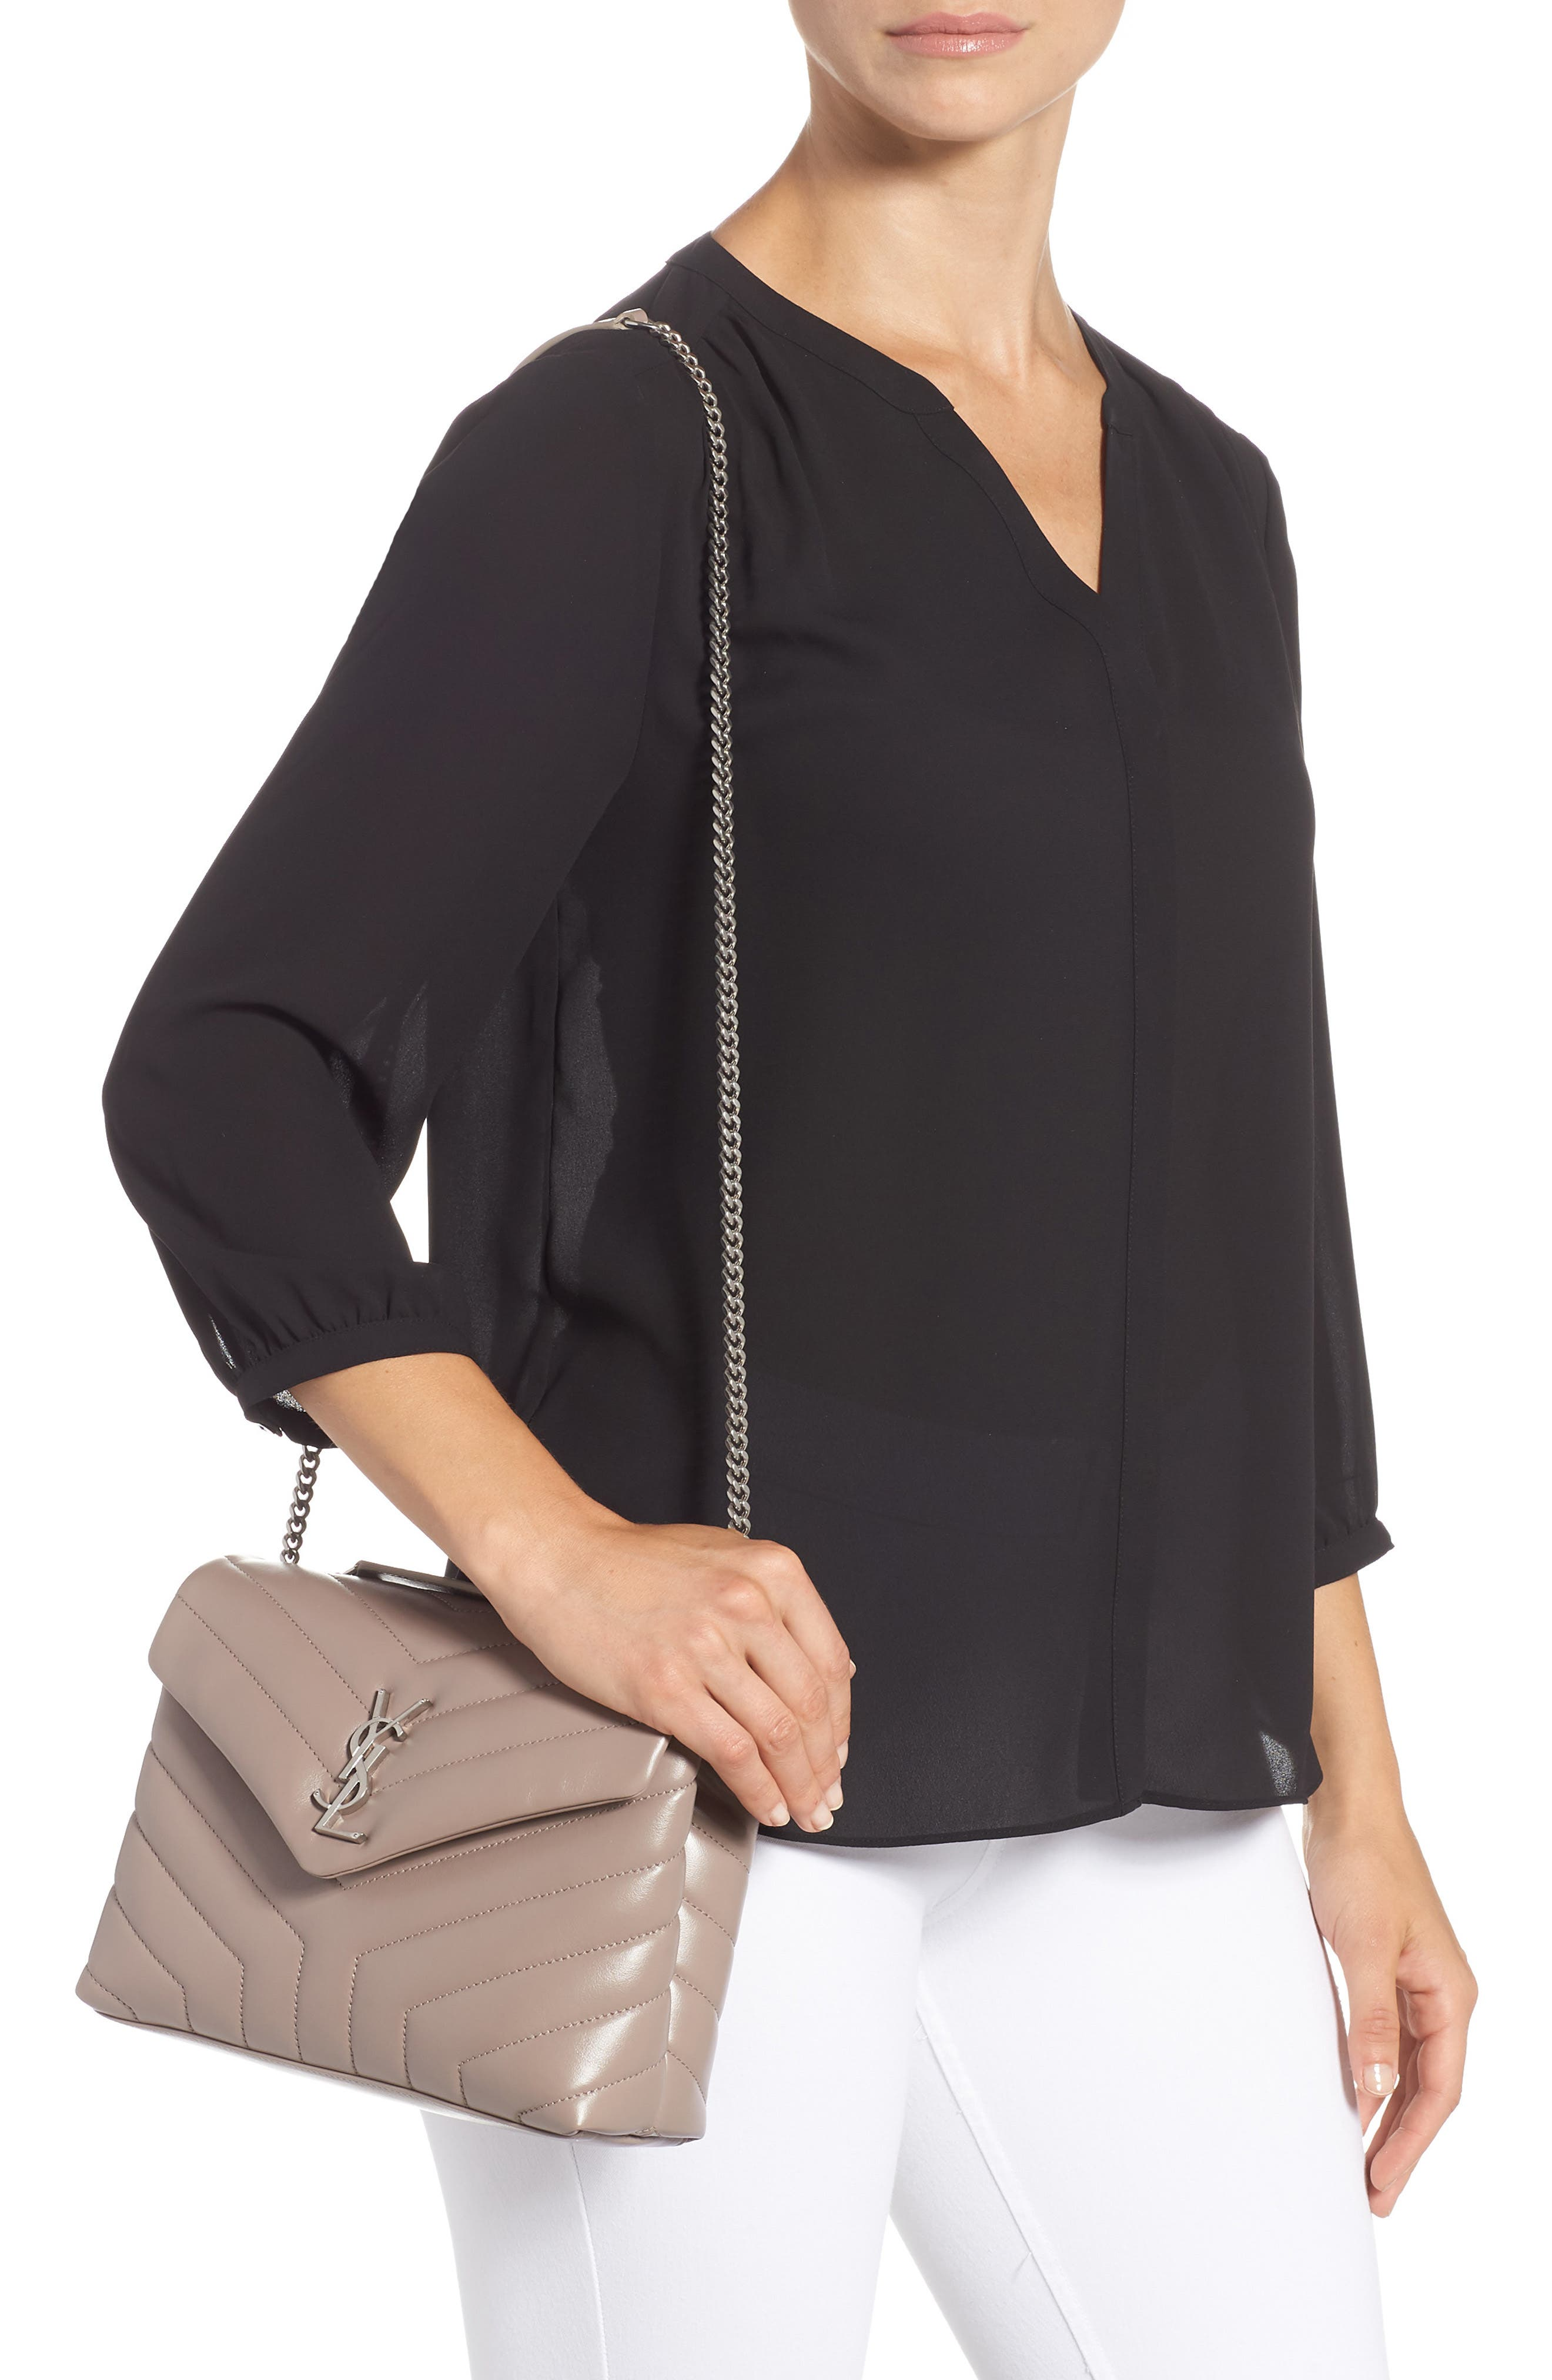 Small Loulou Matelassé Leather Shoulder Bag,                             Alternate thumbnail 2, color,                             TAUPE SABLE